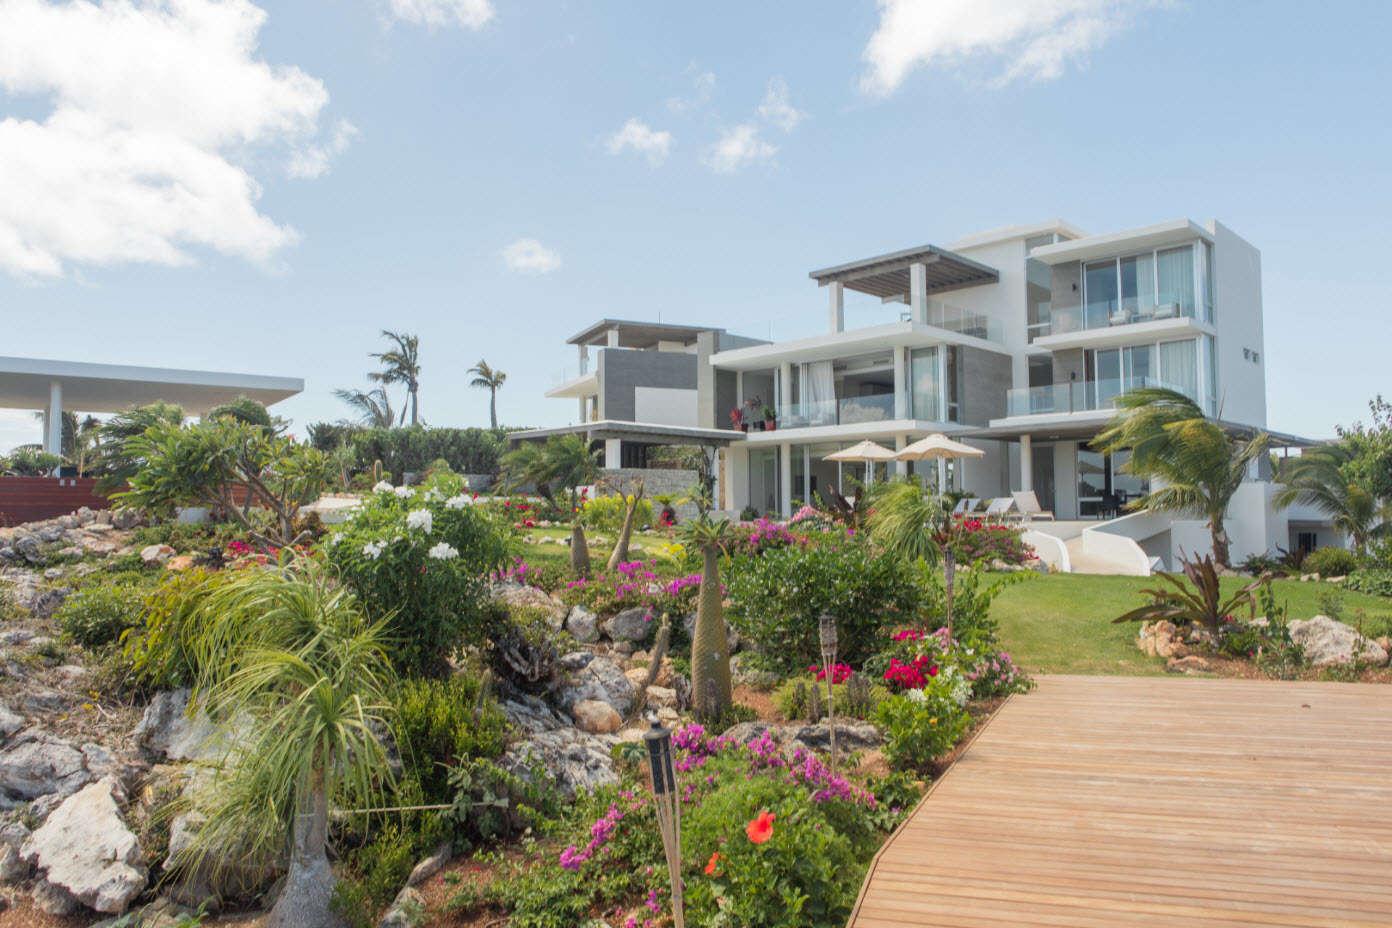 Luxury villa rentals caribbean - Anguilla - Littlebay - South Villa | Ani Anguilla - Image 1/8